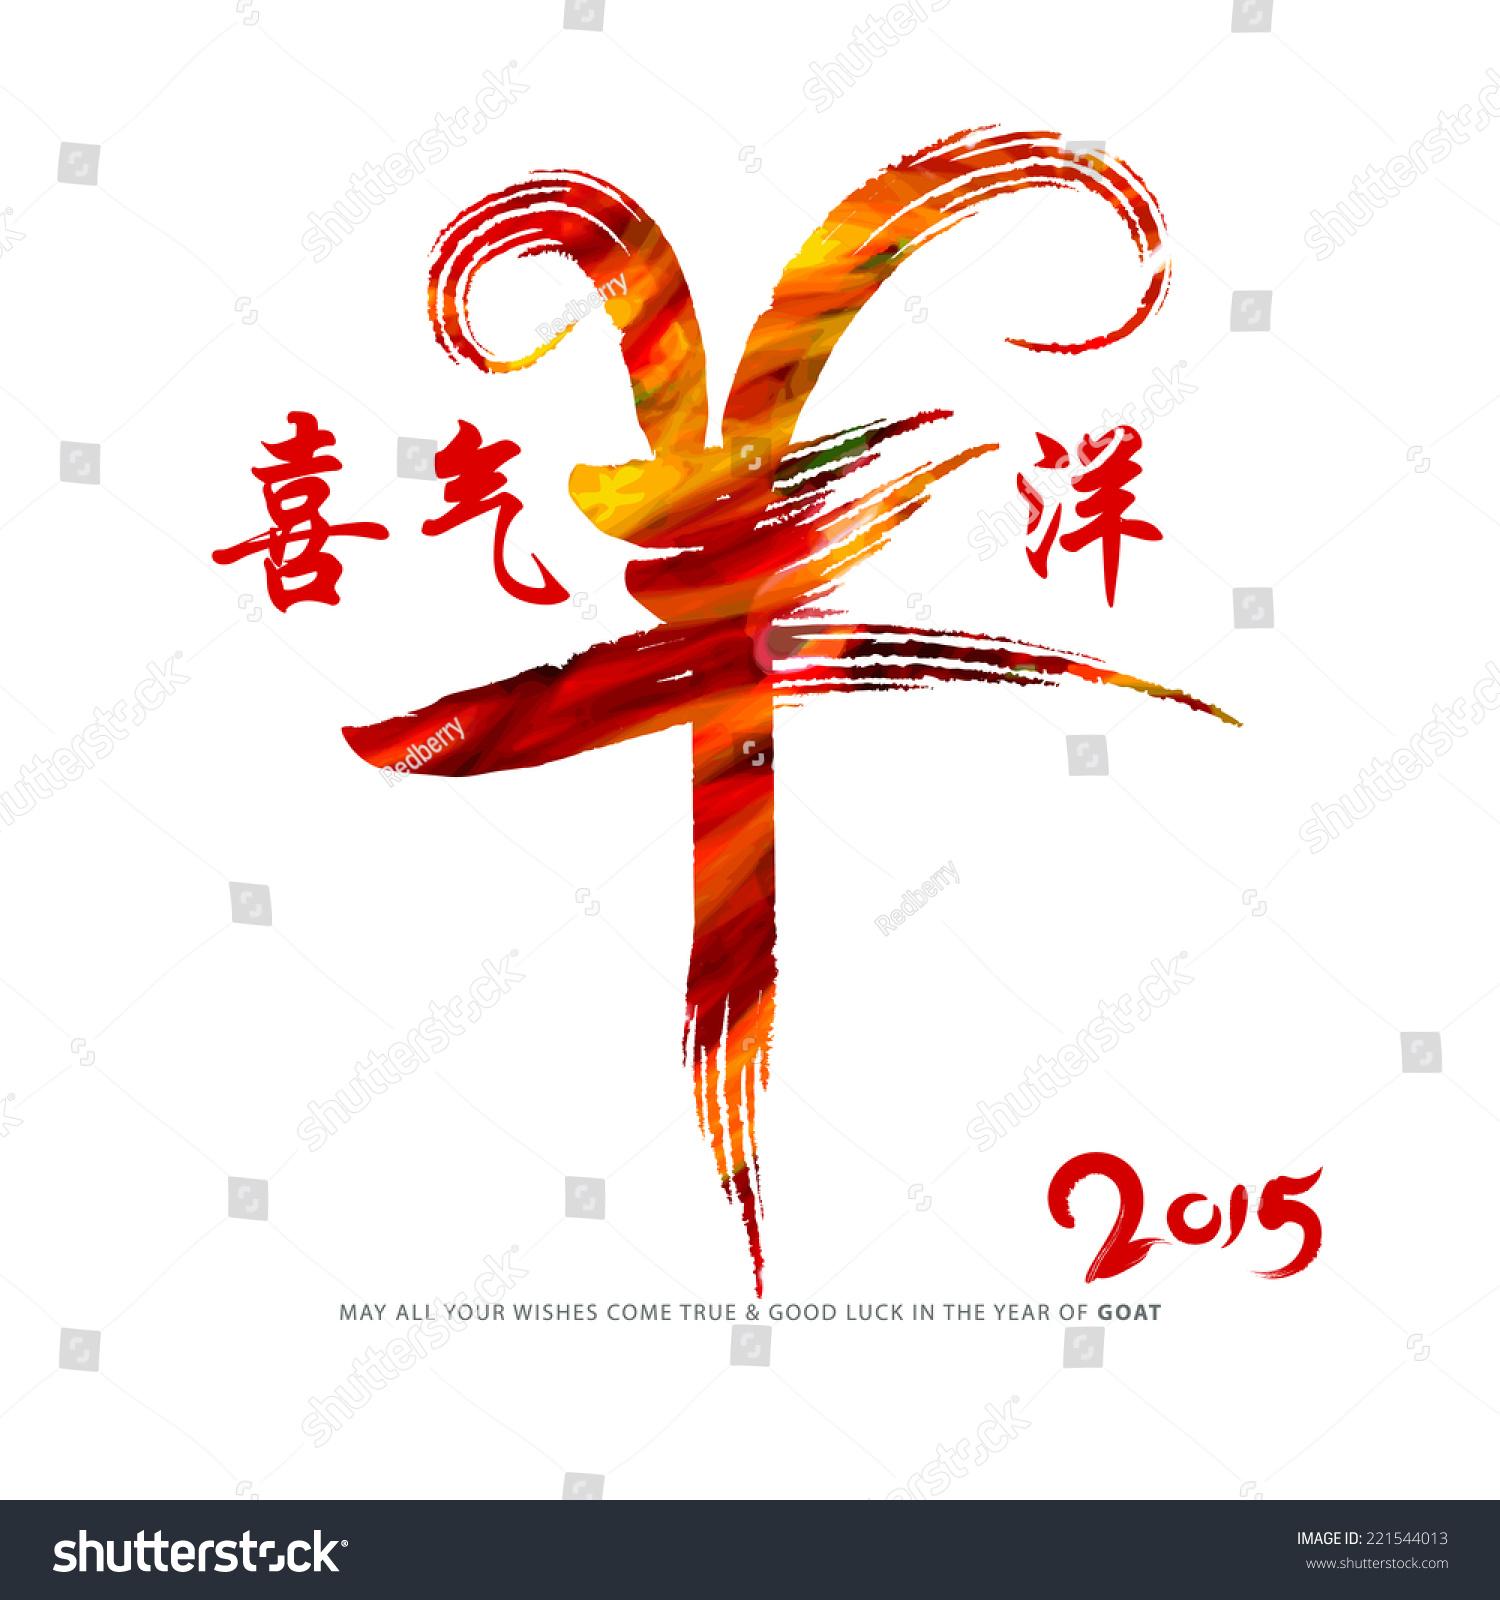 Chinese year goat character design character stock vector chinese year of goat character design the character xi qi yang yang be biocorpaavc Images